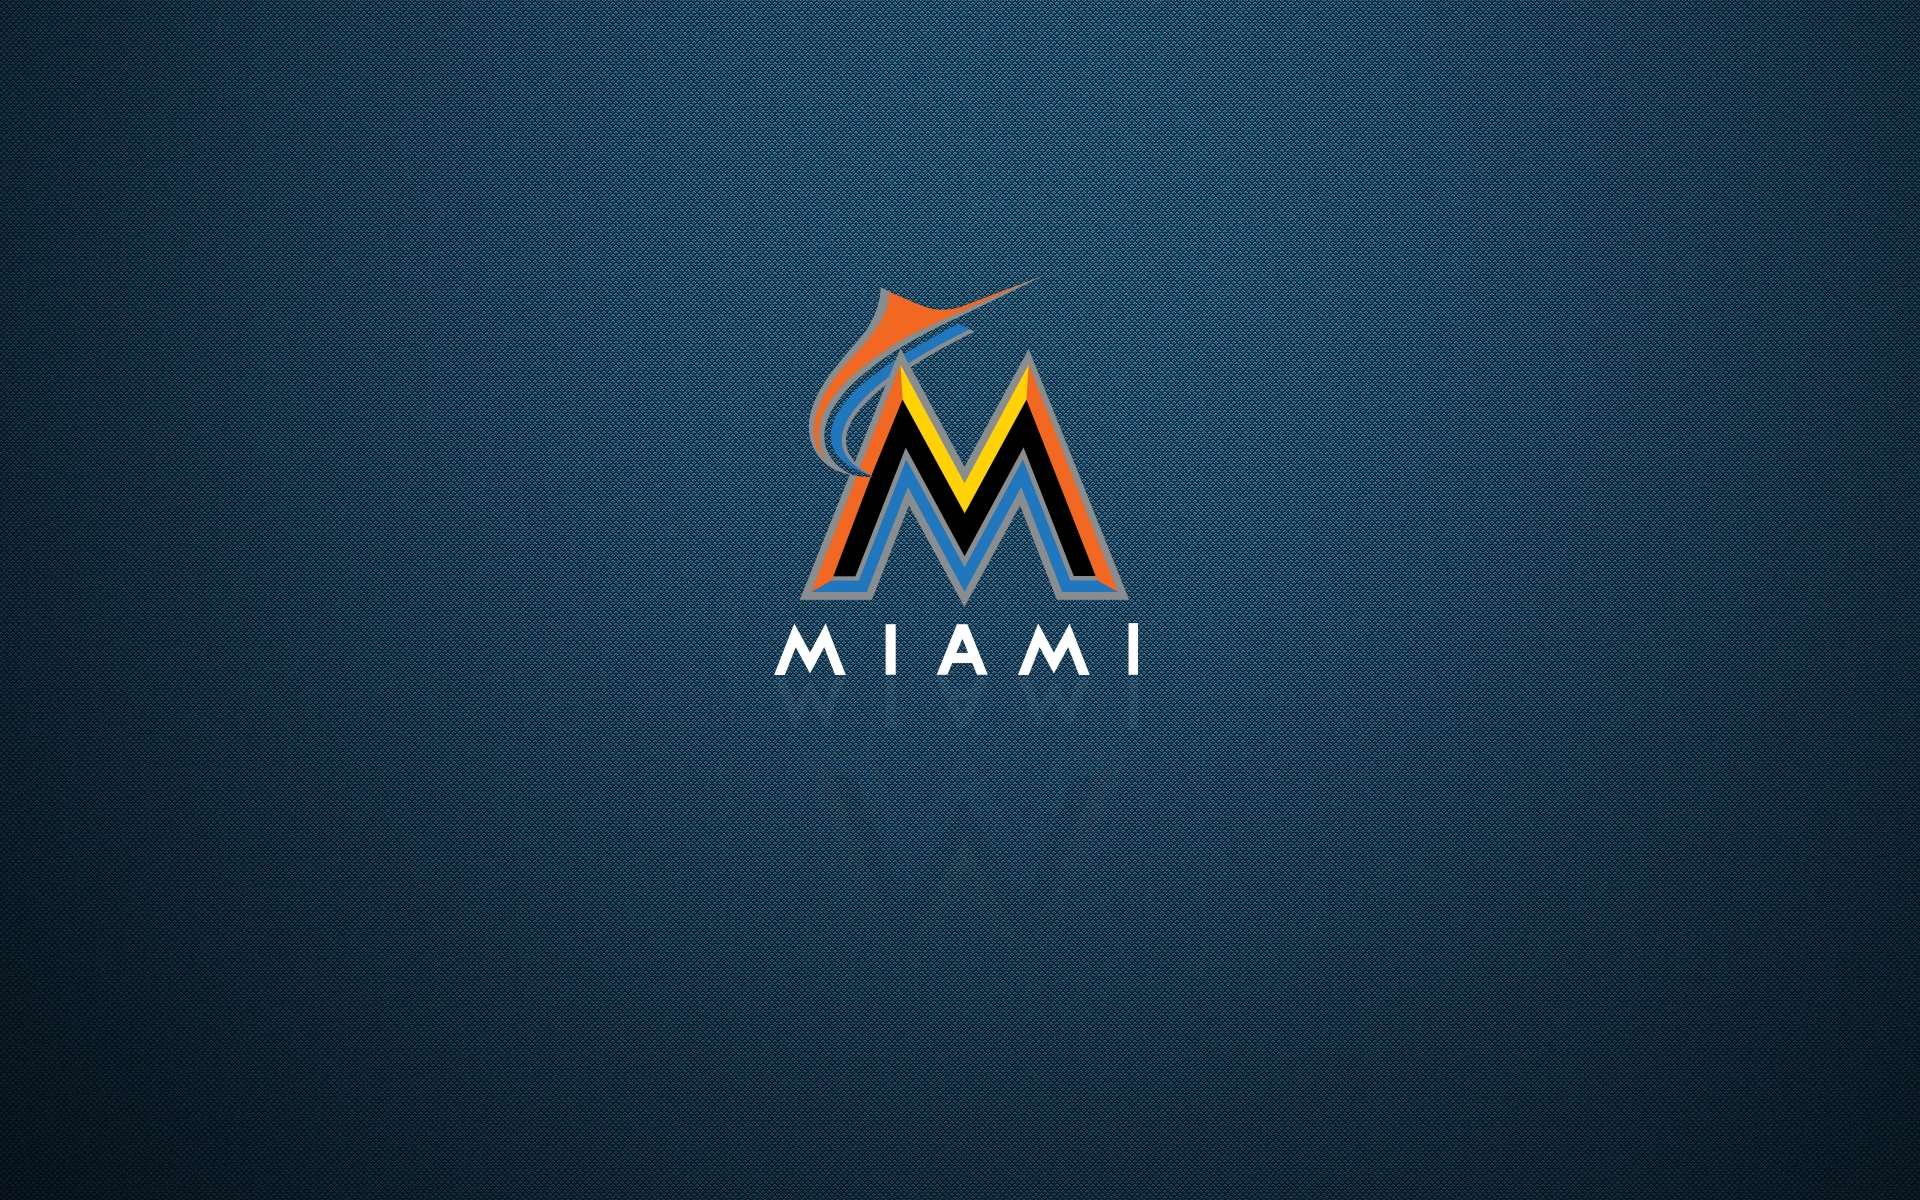 Phillies Iphone Wallpaper Miami Marlins Logos Download